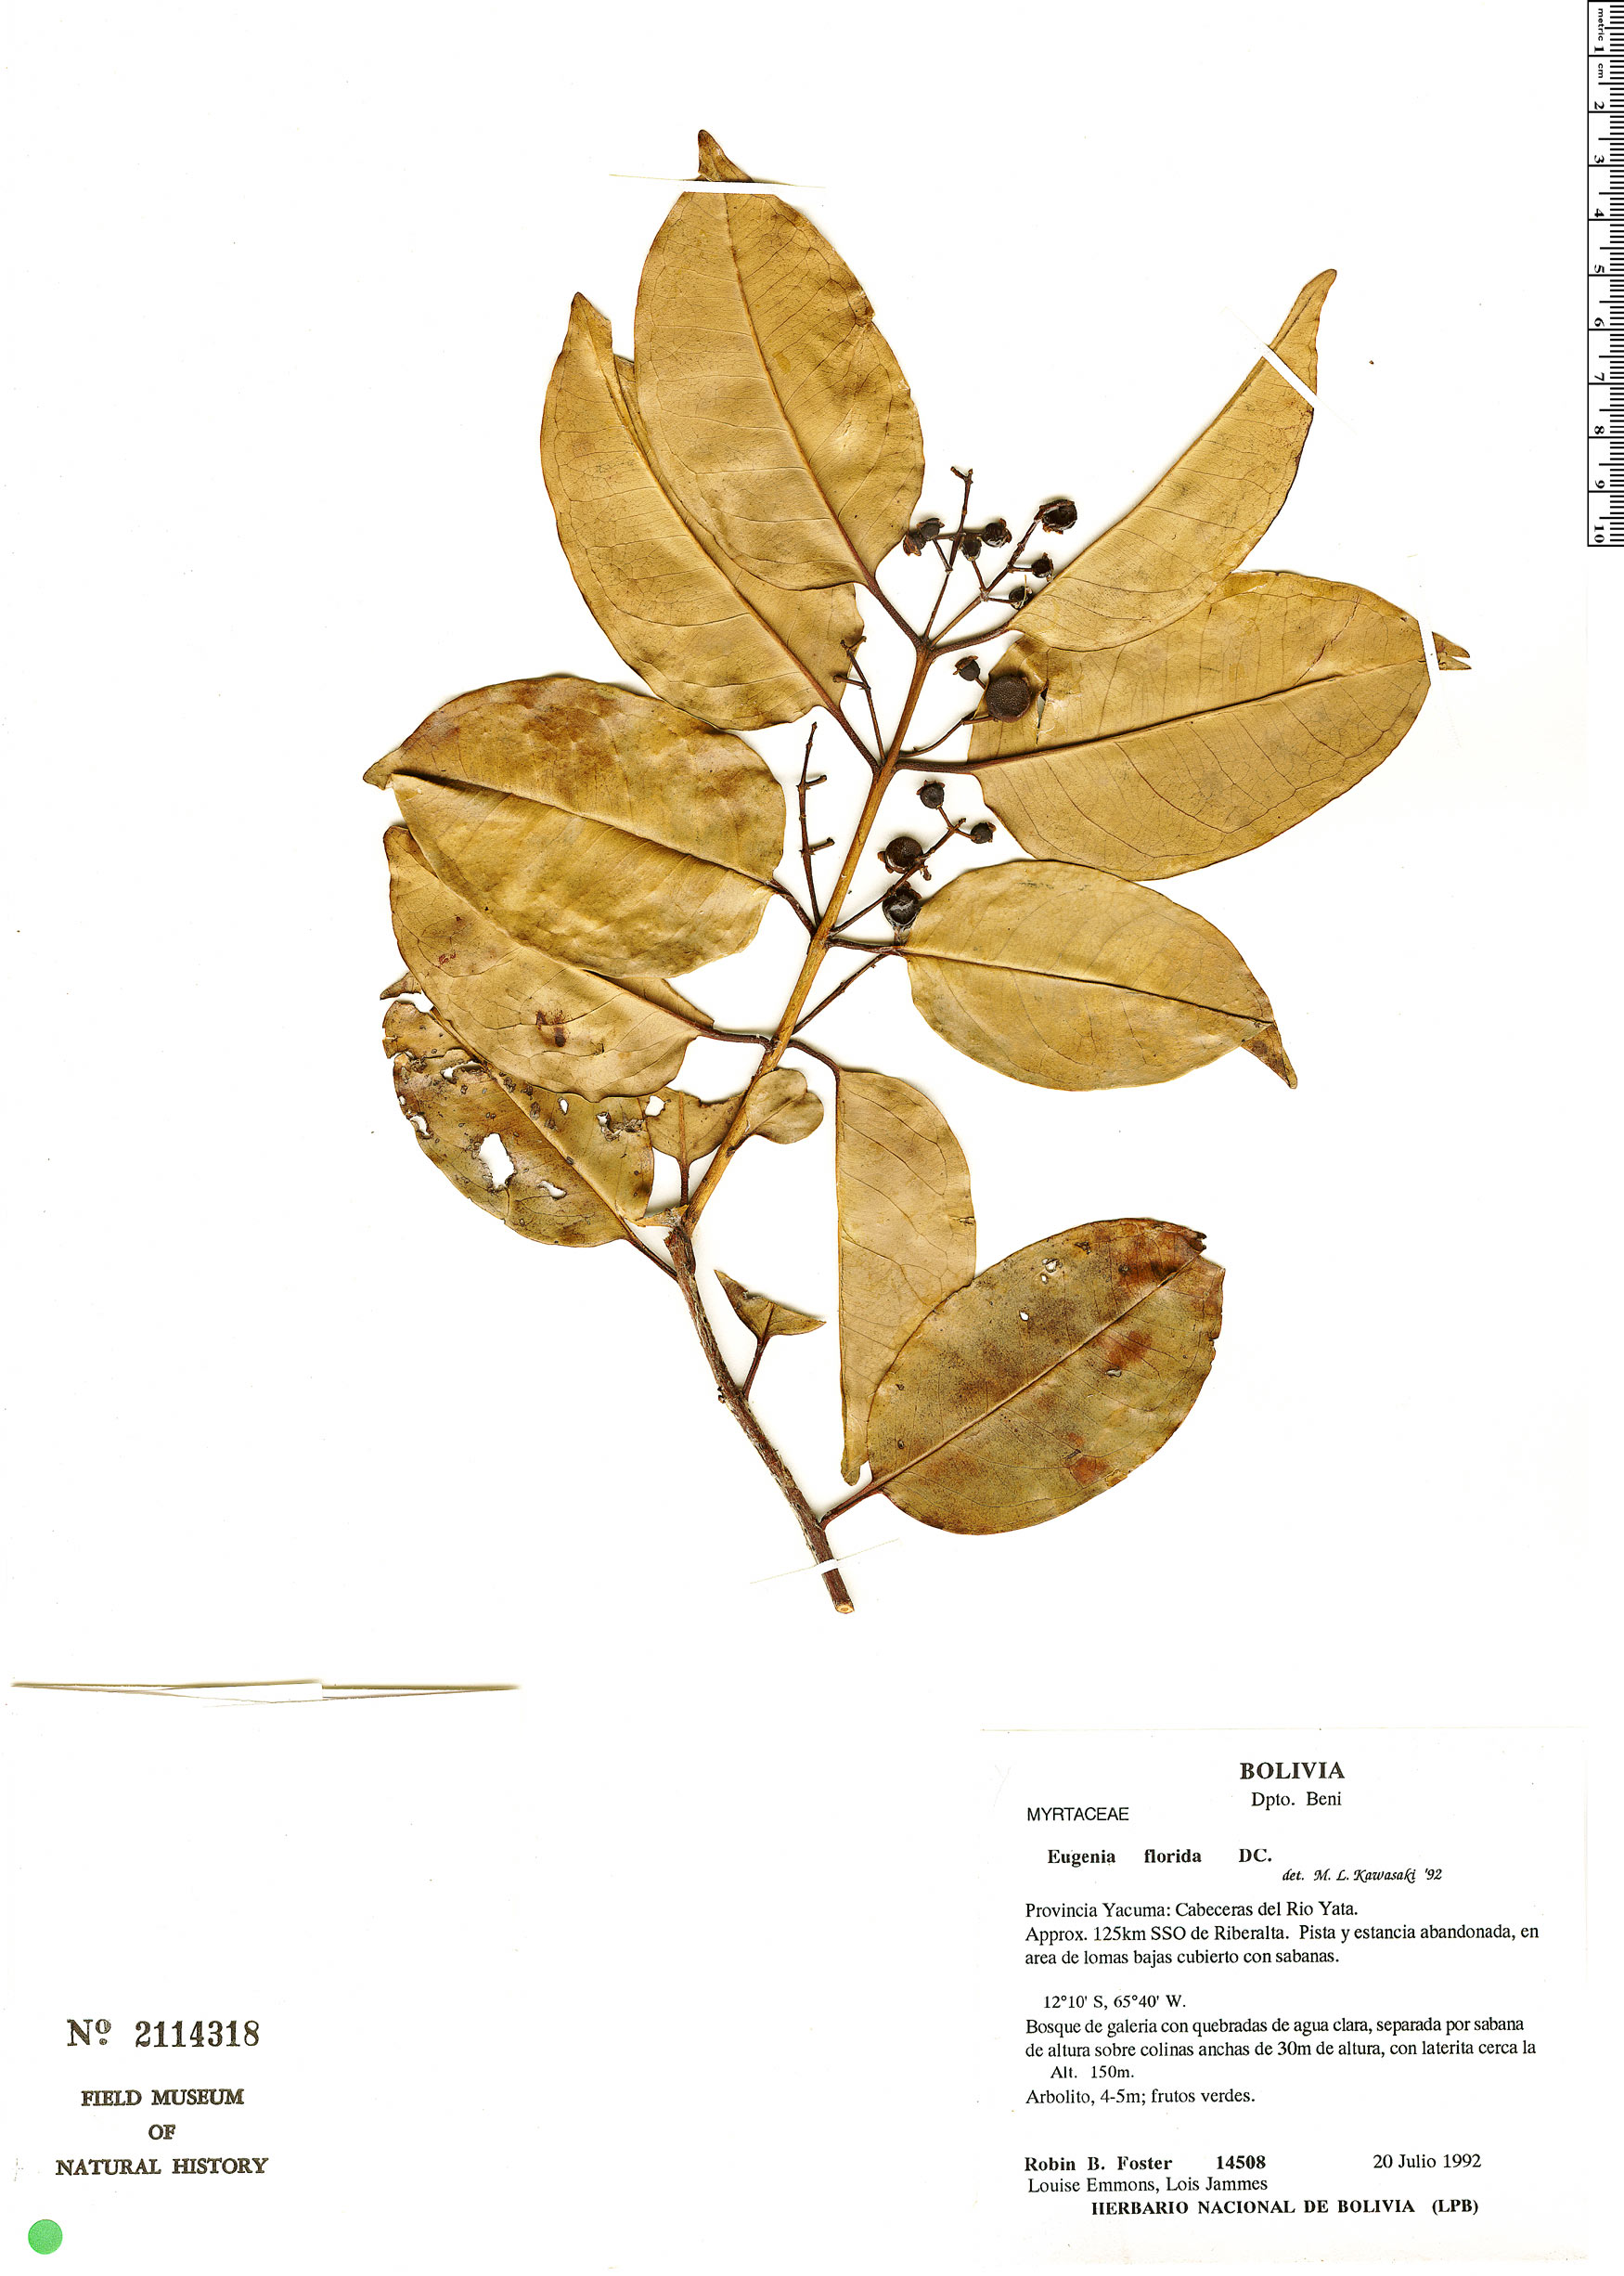 Specimen: Eugenia florida